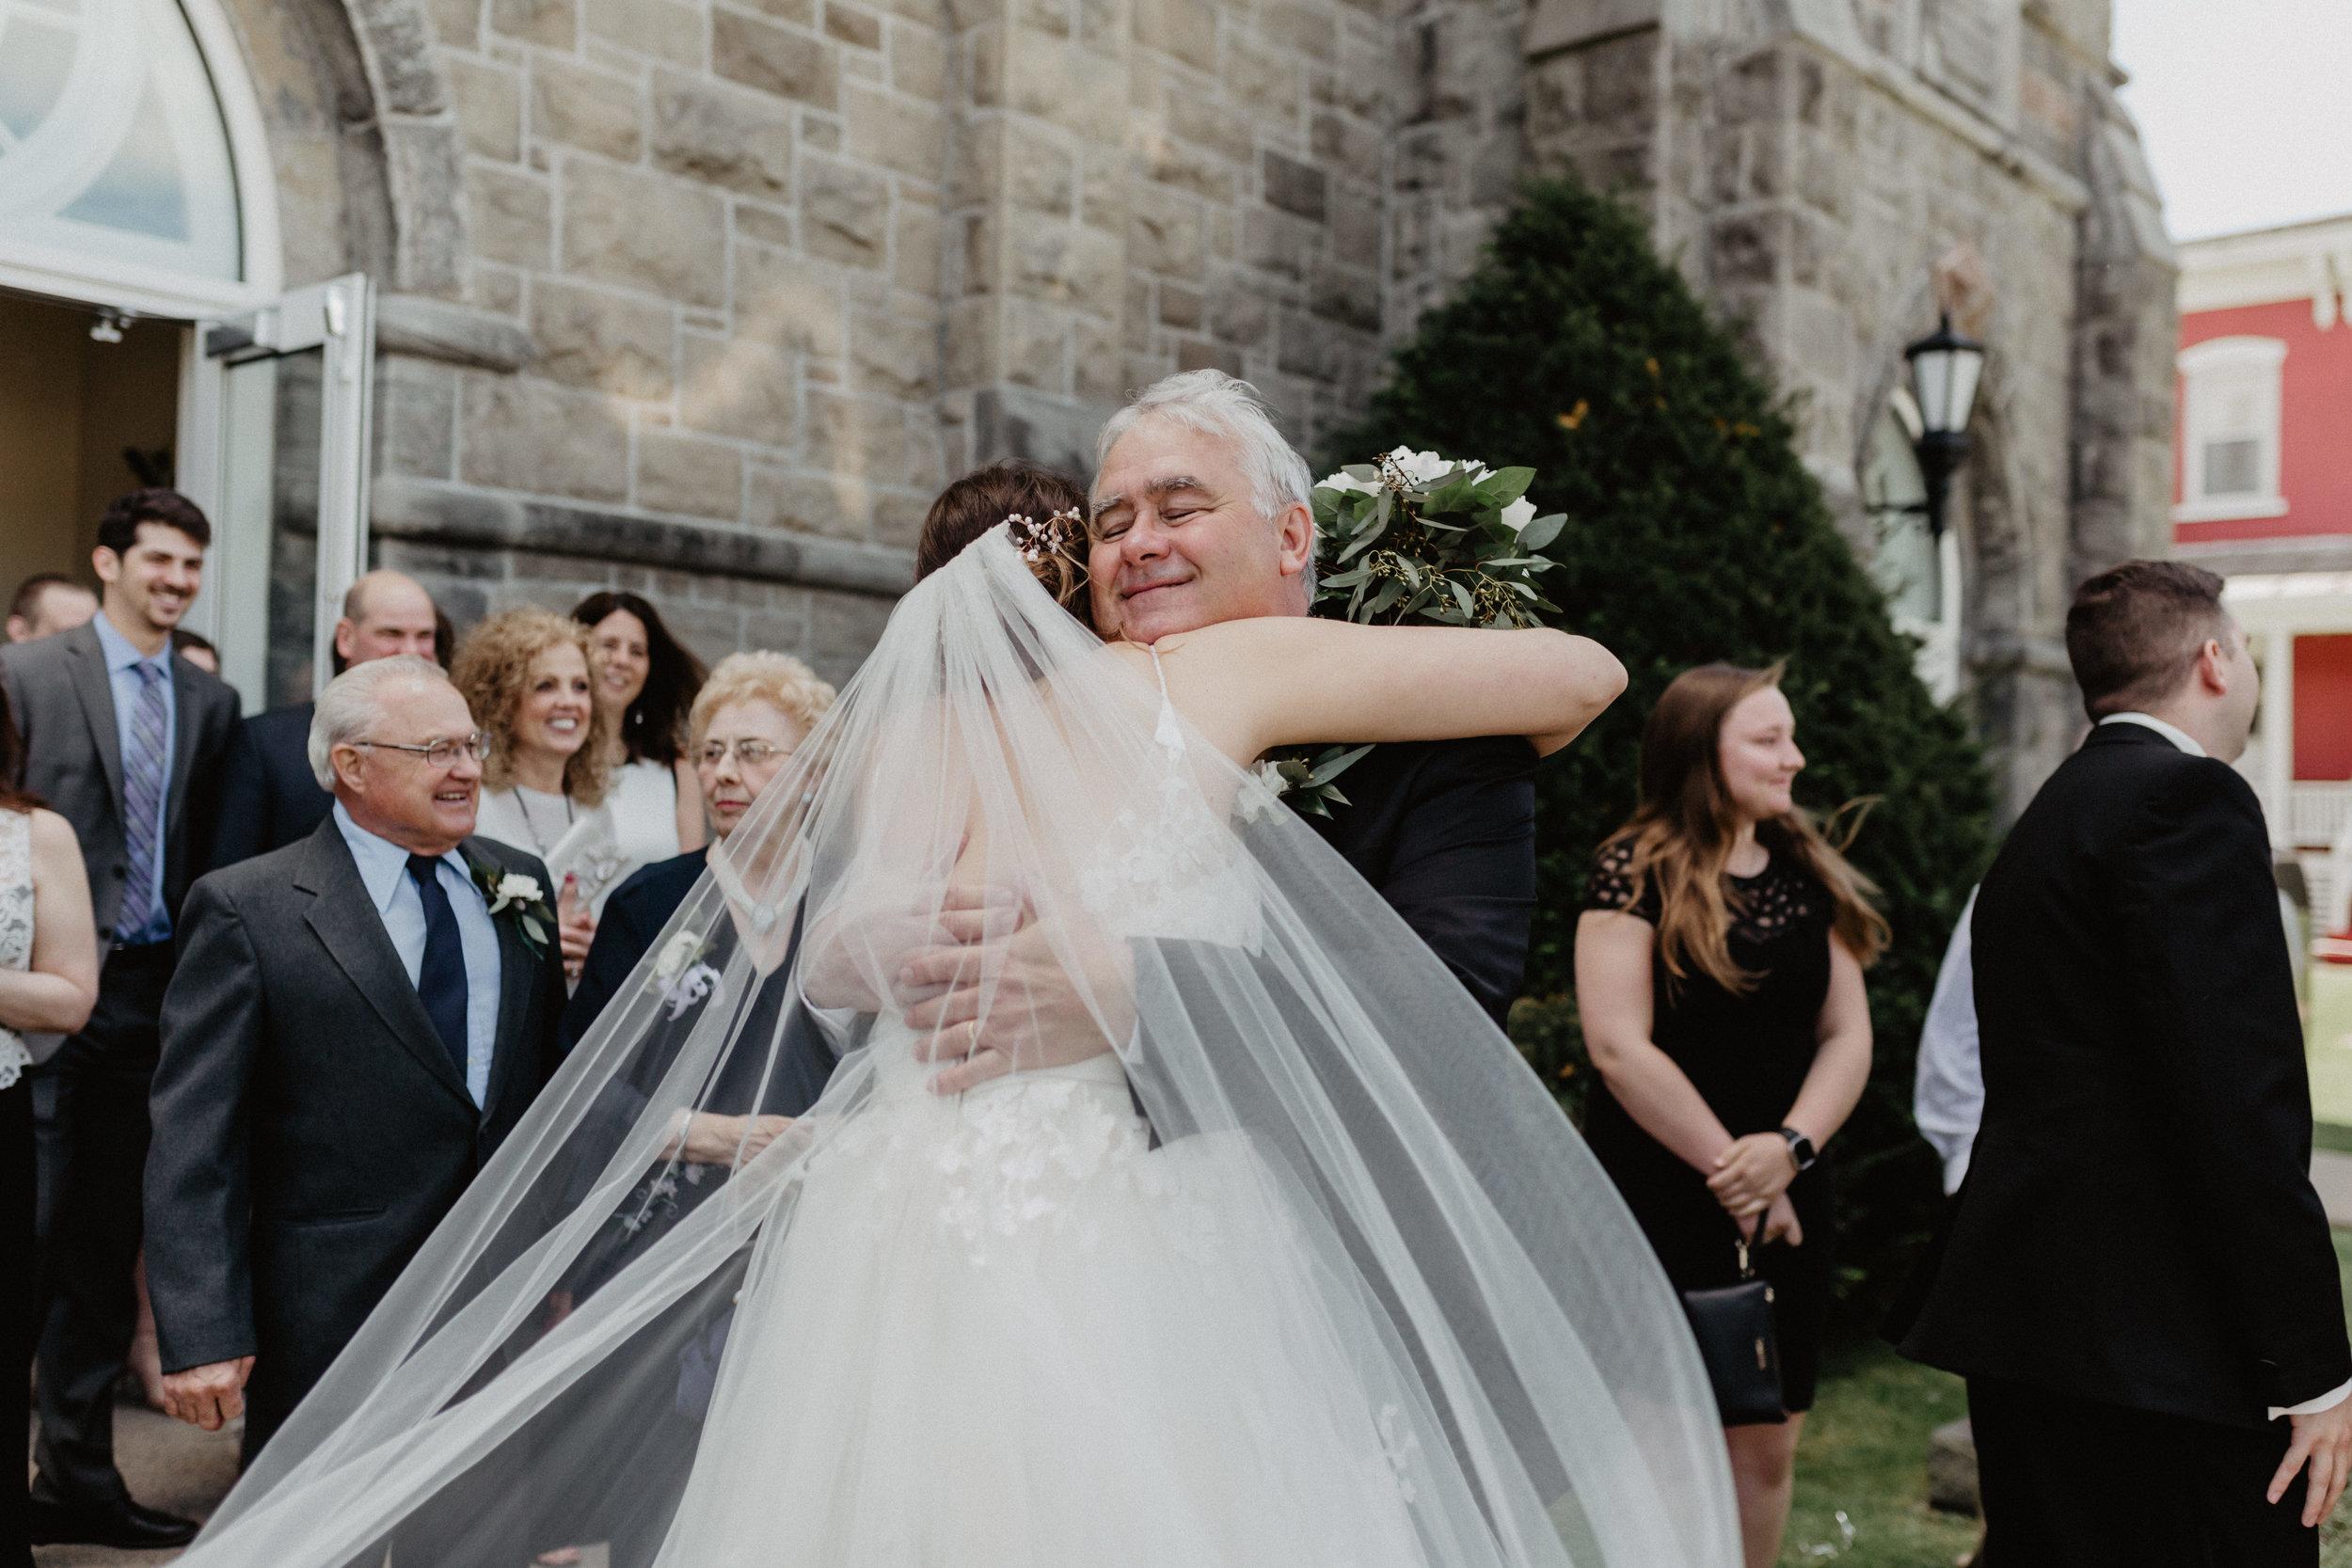 upstate_ny_wedding-32.jpg